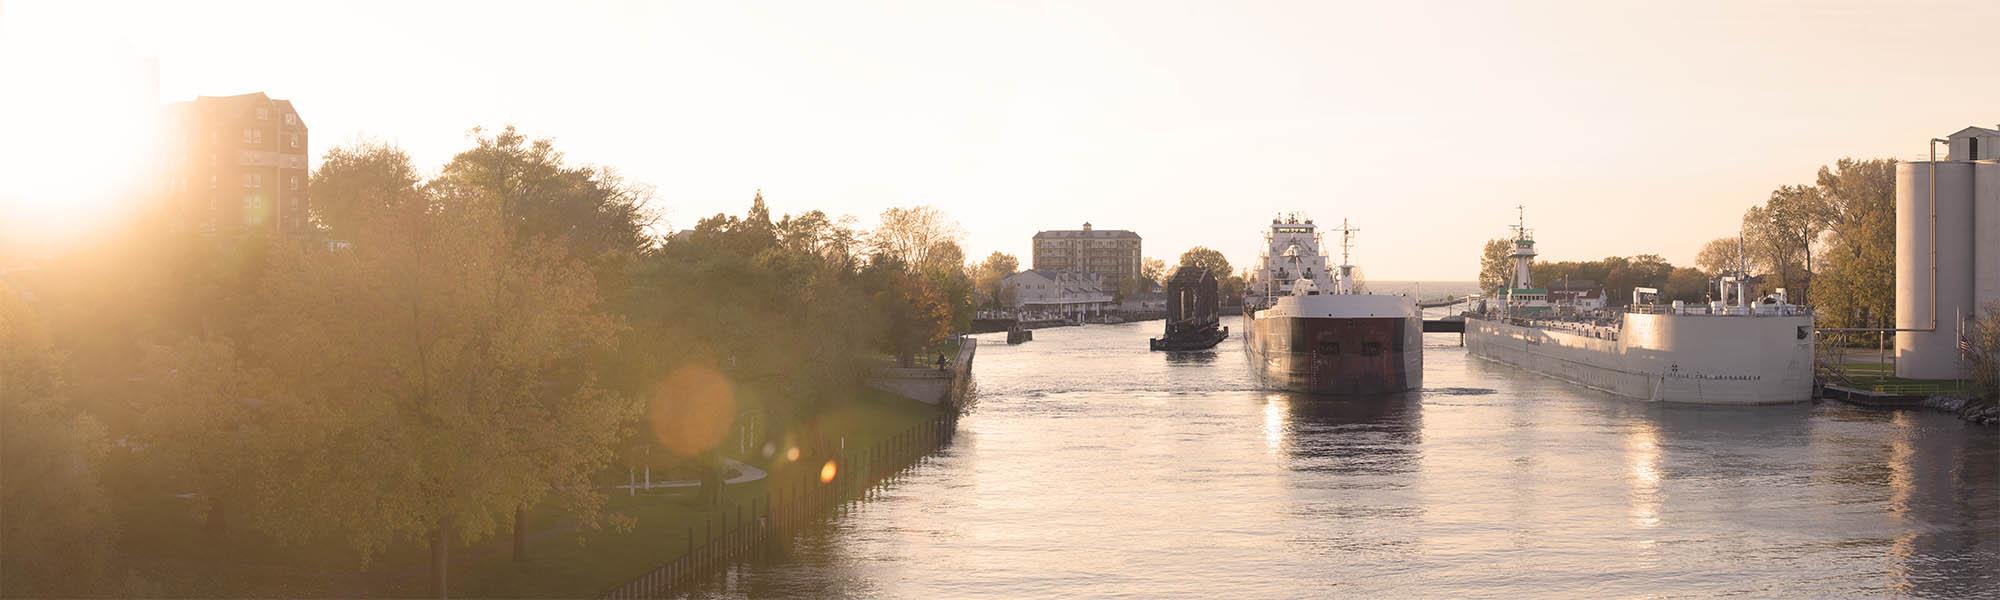 SJ_River_Ship_Panorama_Joshua_Nowicki